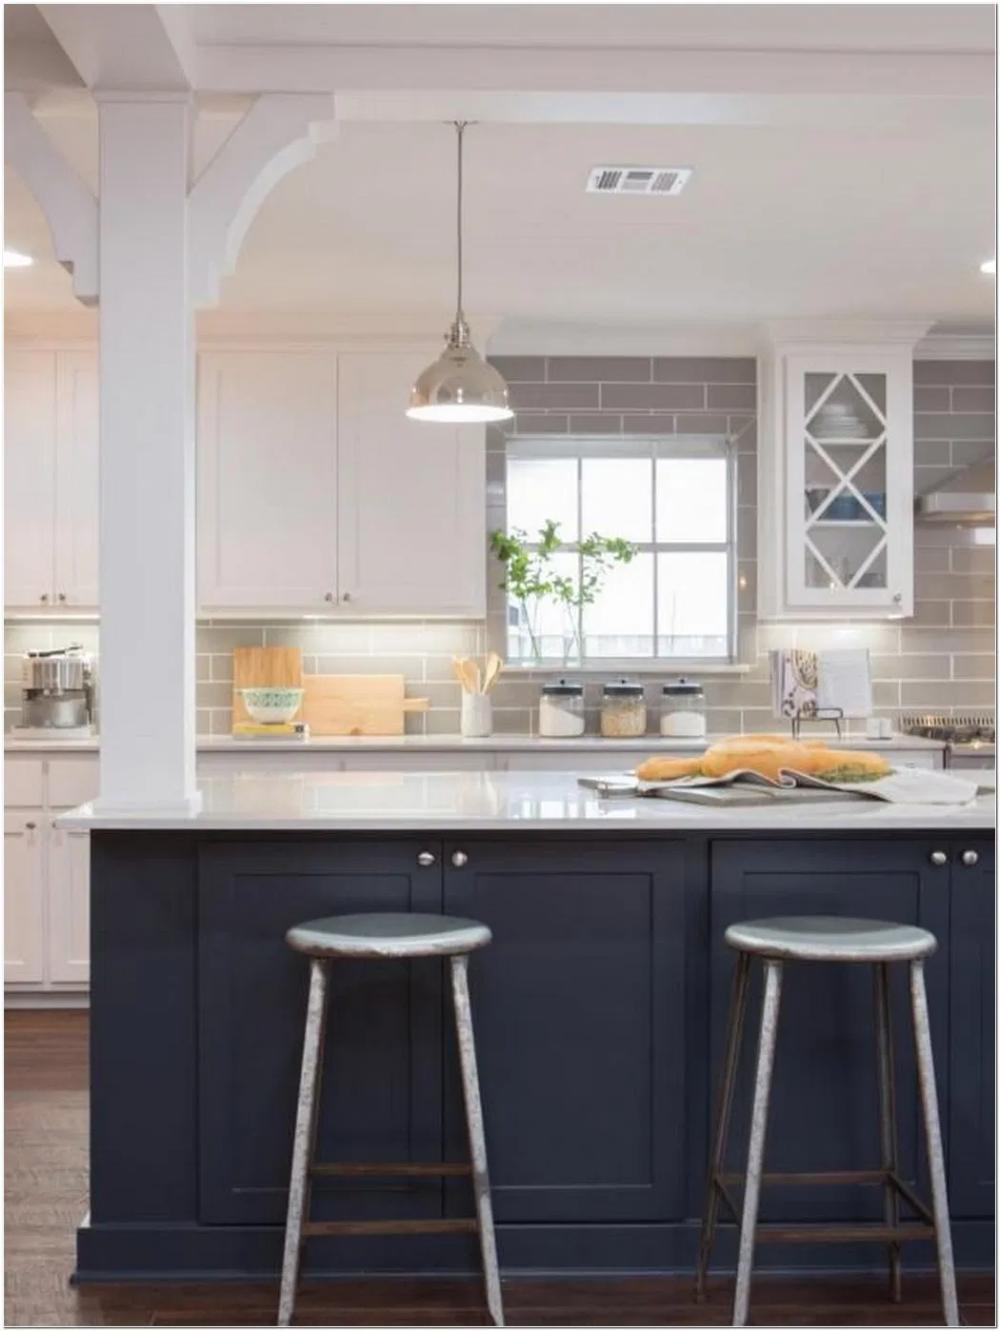 75 modern farmhouse kitchens and cabinets joanna gaines 24 dougryanhomes on farmhouse kitchen joanna gaines design id=50515